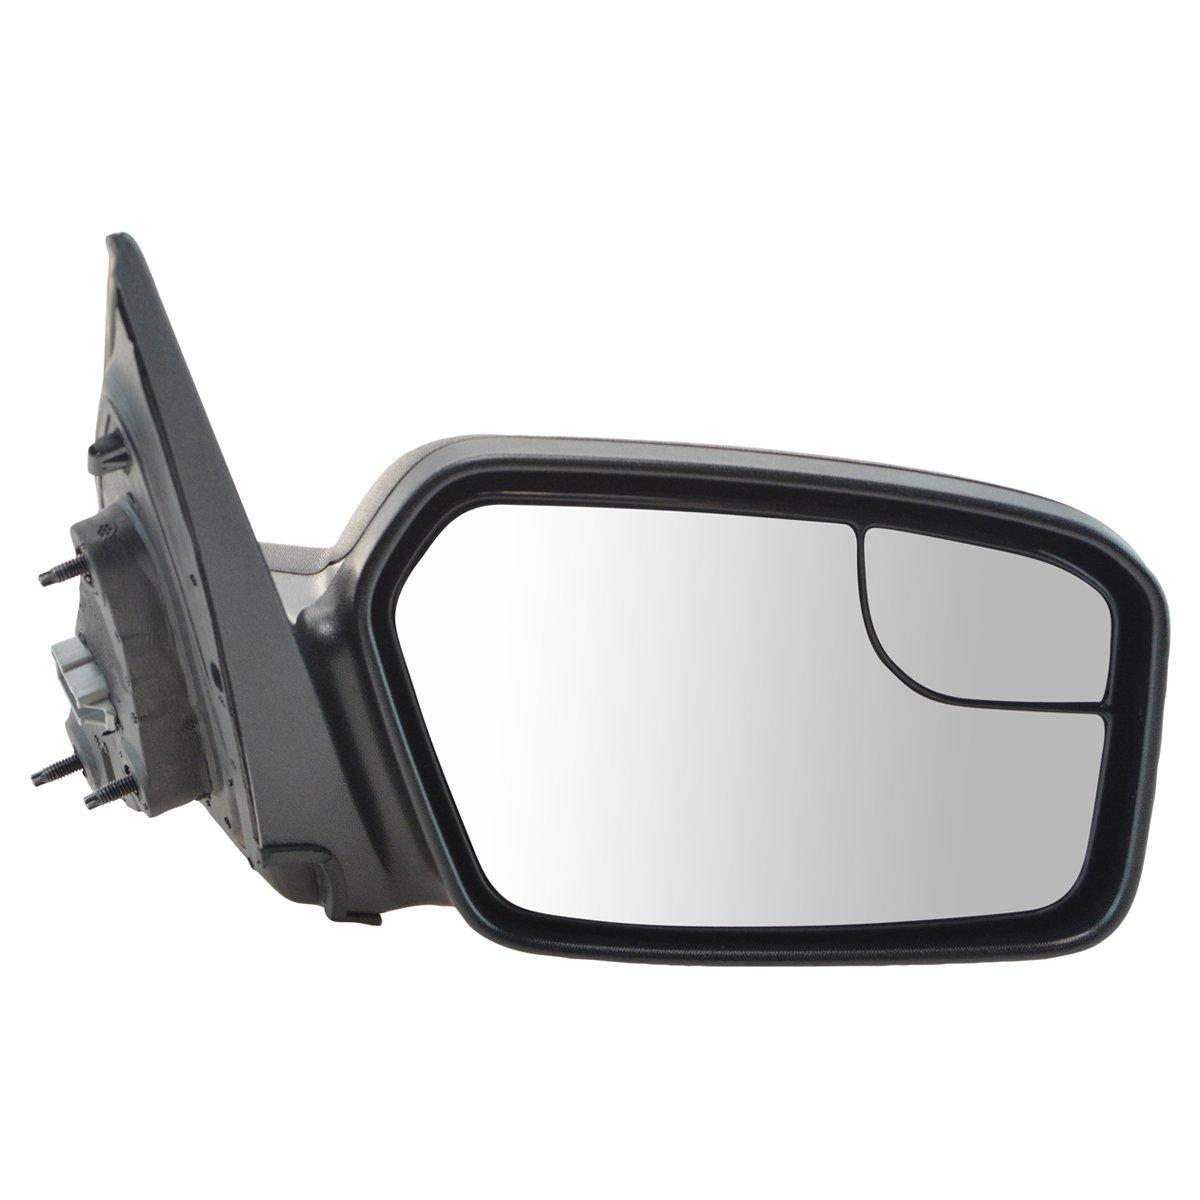 Power Blind Spot Glass Texture Black Mirror RH Passenger Side for Fusion Milan